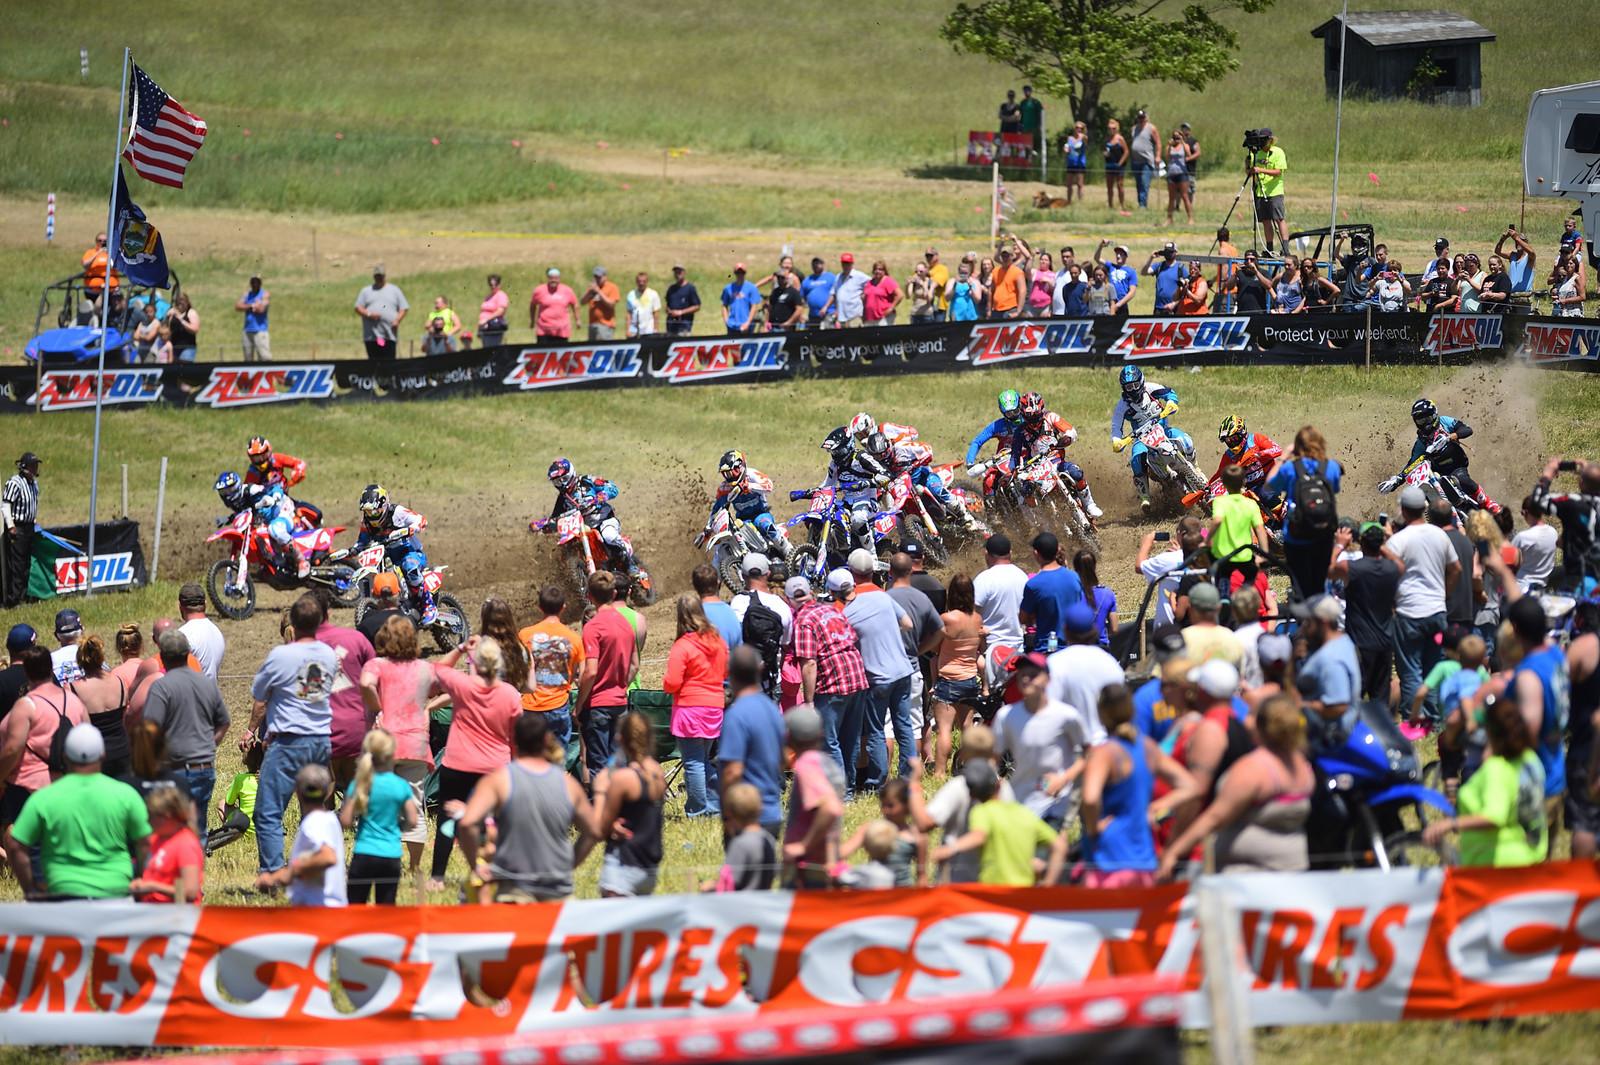 061417gncc002 - Tomahawk GNCC - Motocross Pictures - Vital MX